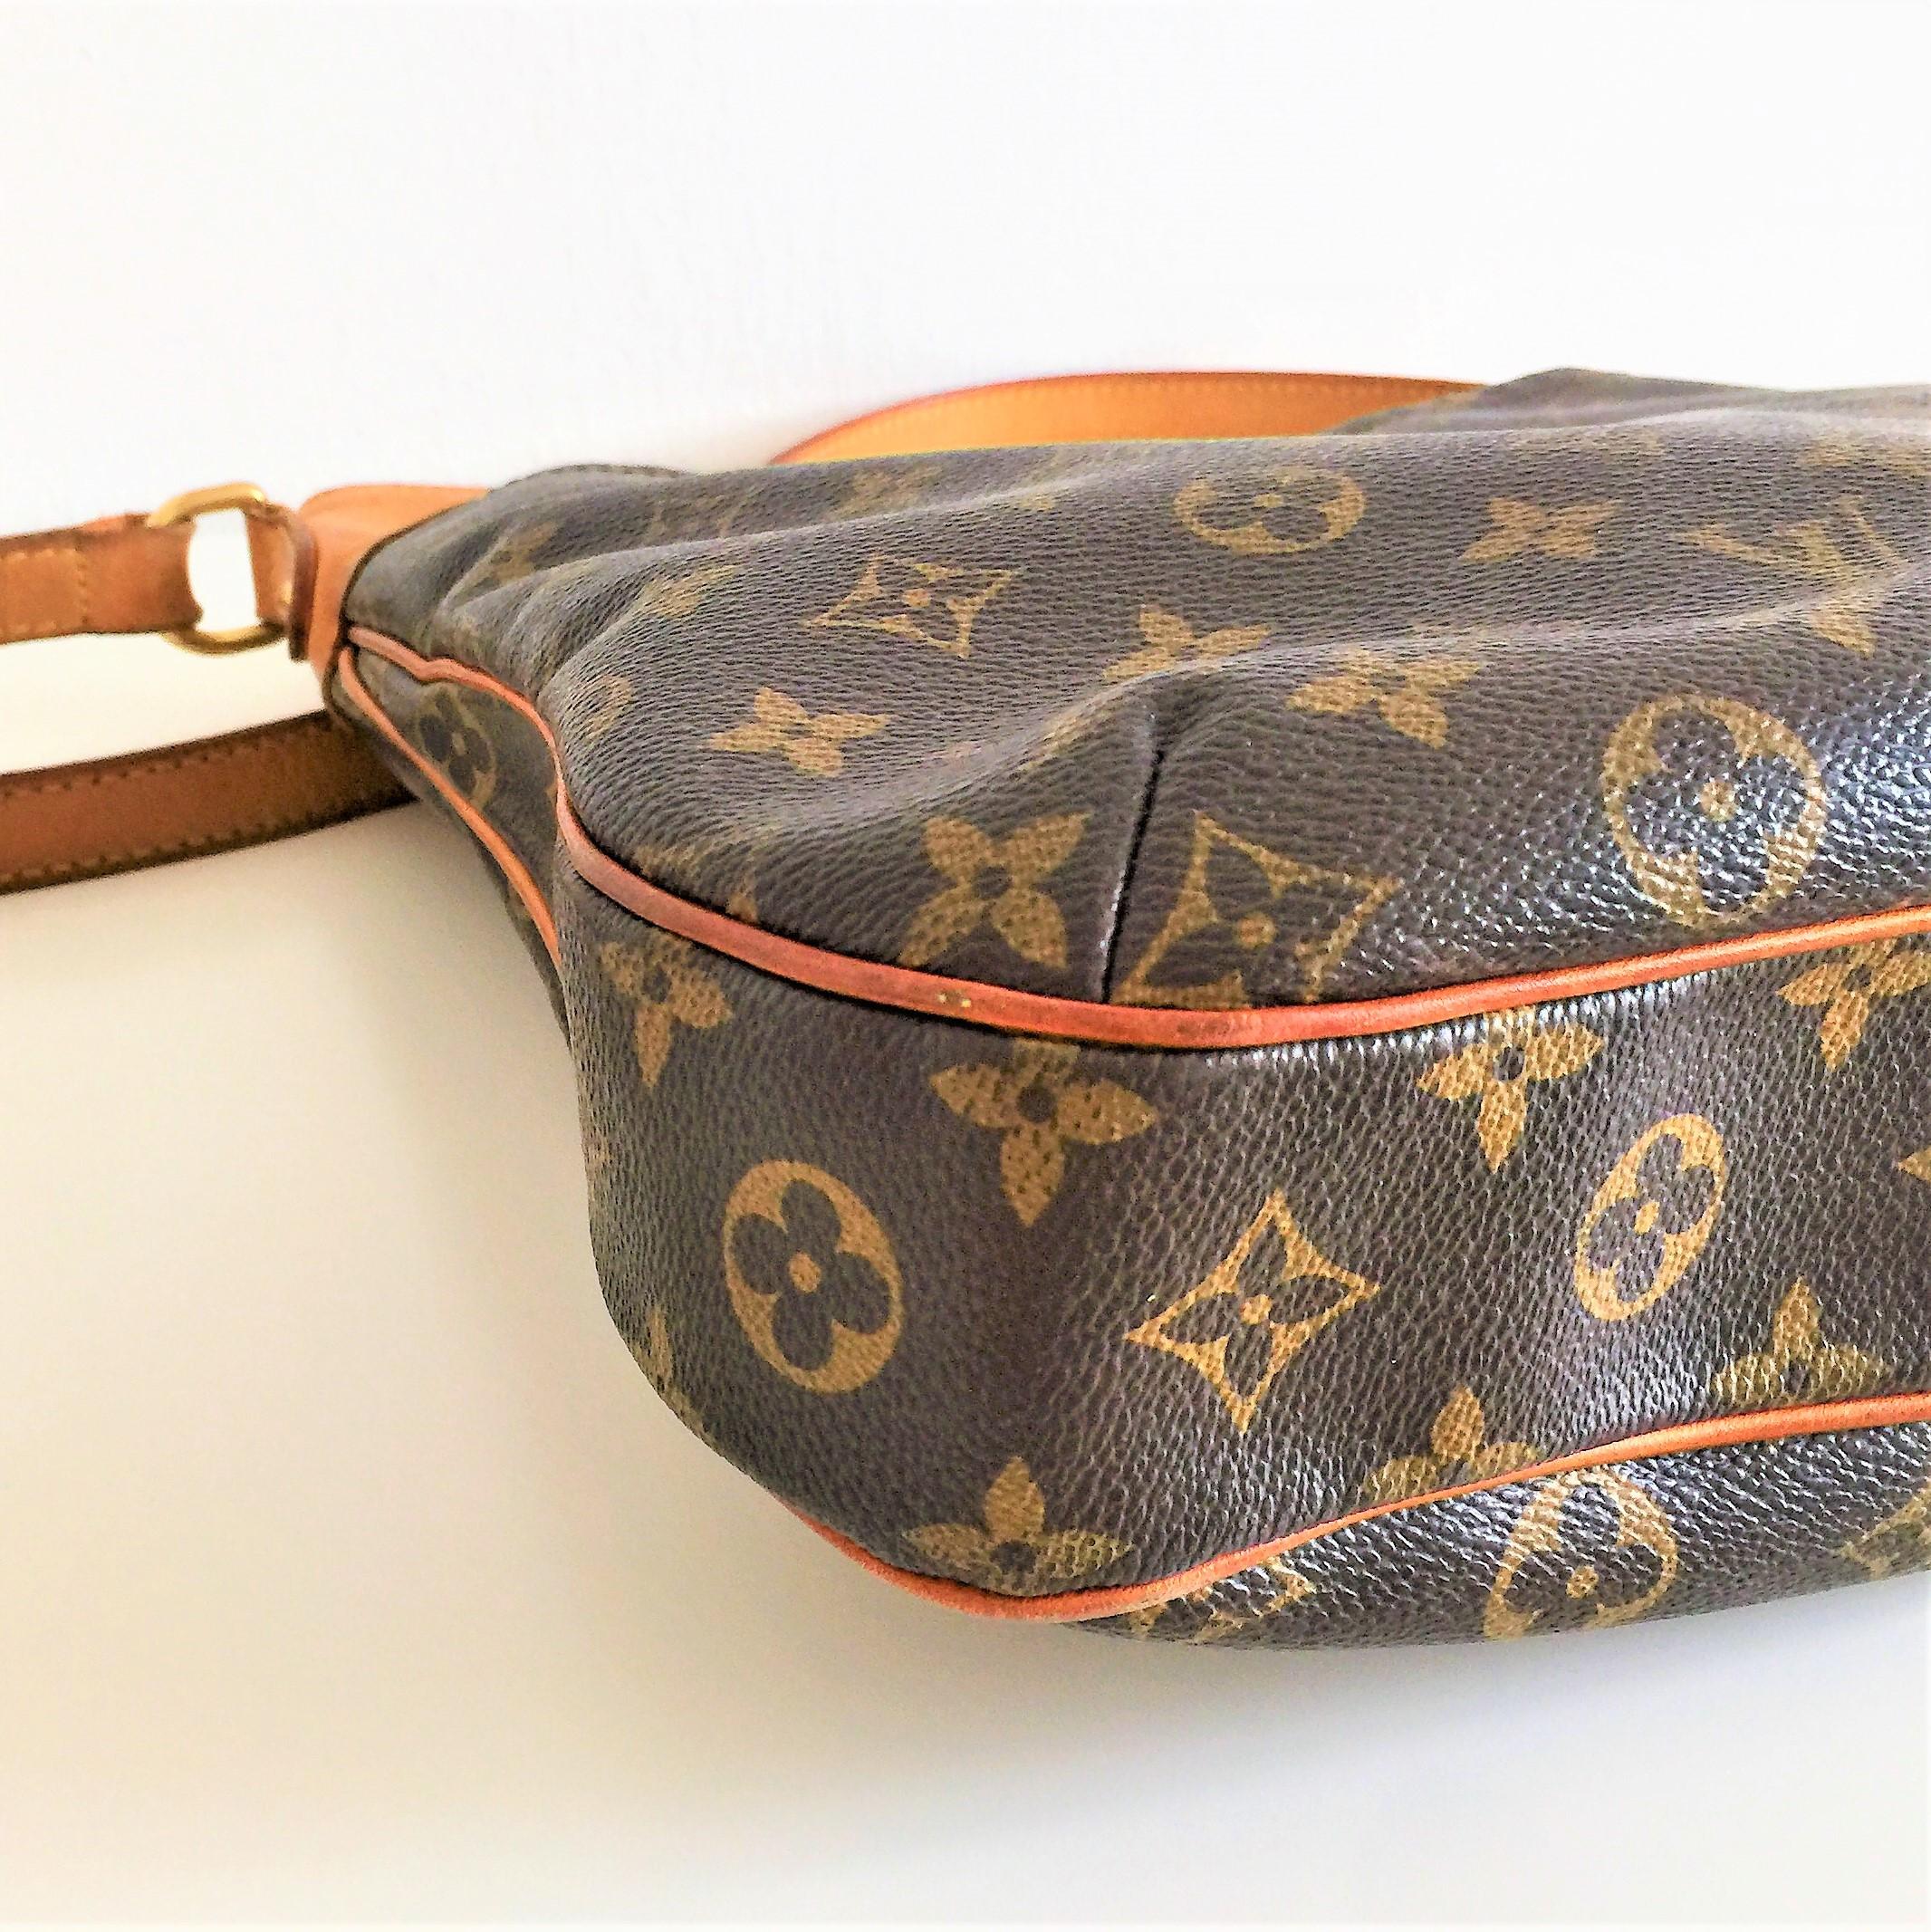 a8f2e75881 Ebay Borse Firmate Louis Vuitton | The Art of Mike Mignola